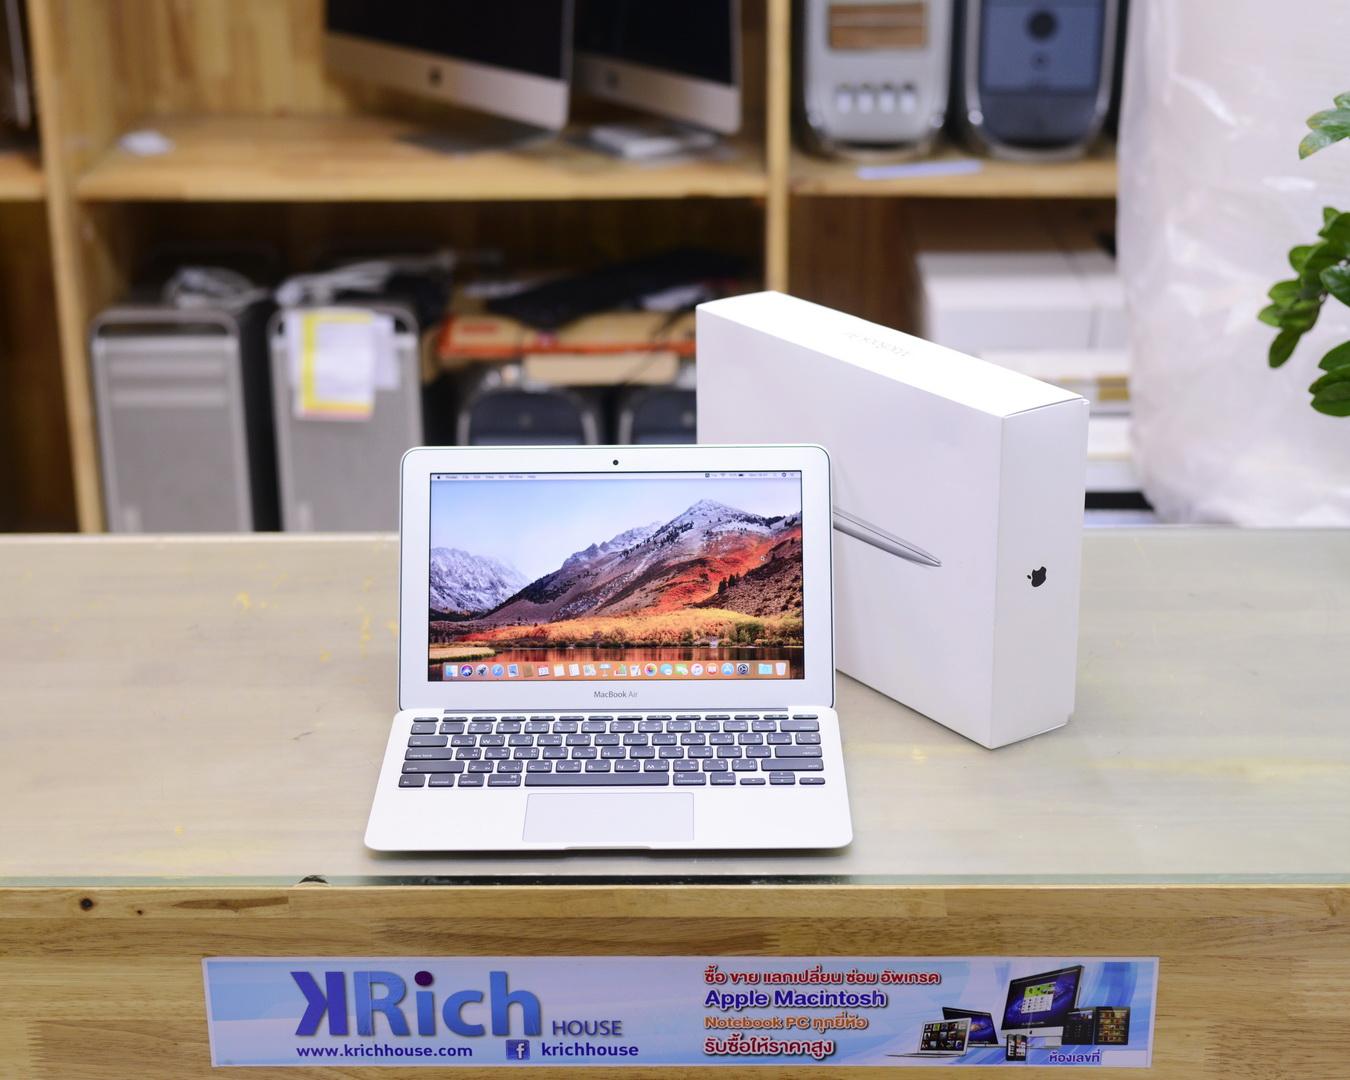 MacBook Air (11-inch, Early 2015) Core i5 1.6GHz RAM 4GB SSD 128GB - FullBox